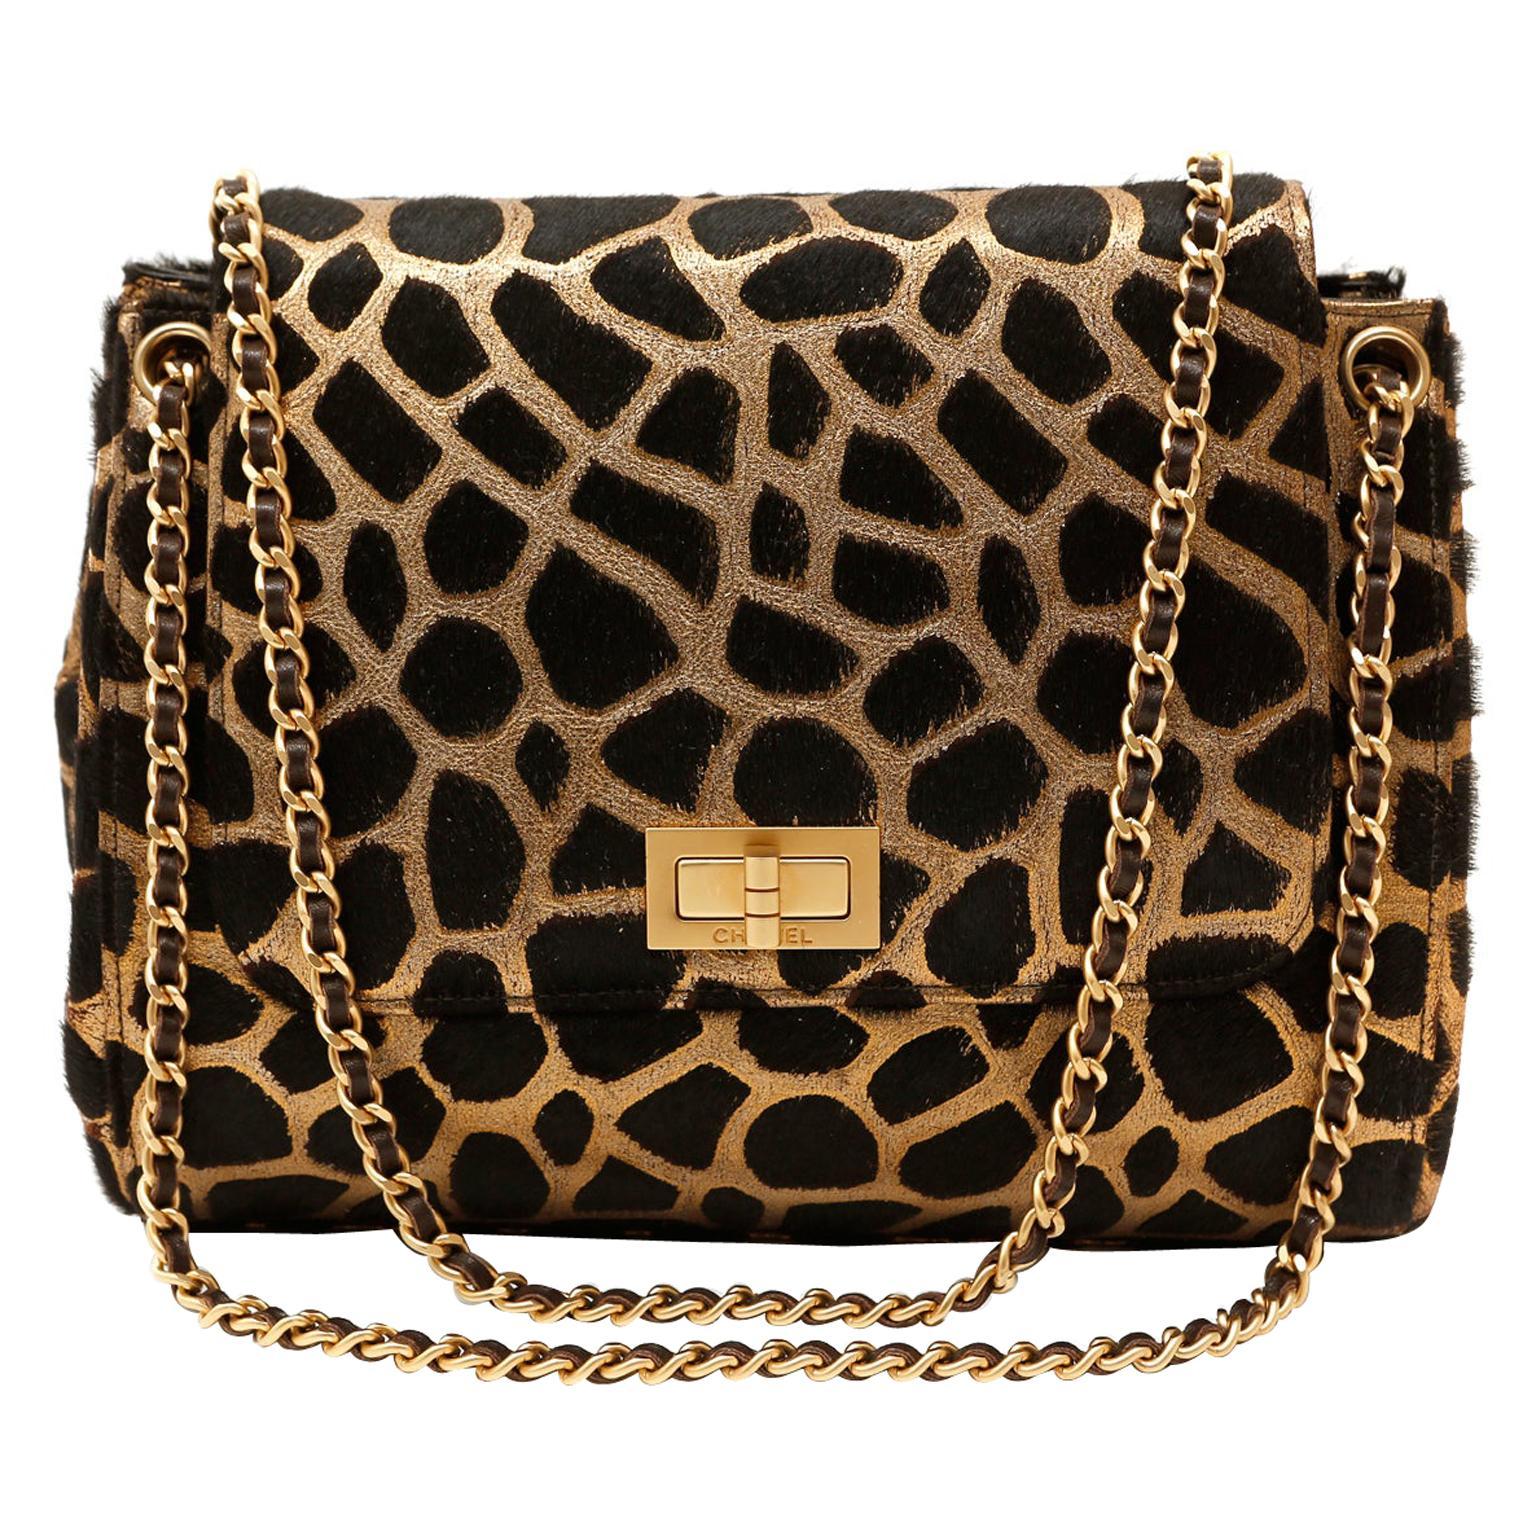 Chanel Giraffe Pattern Calf Hair Flap Bag Ltd. Ed.